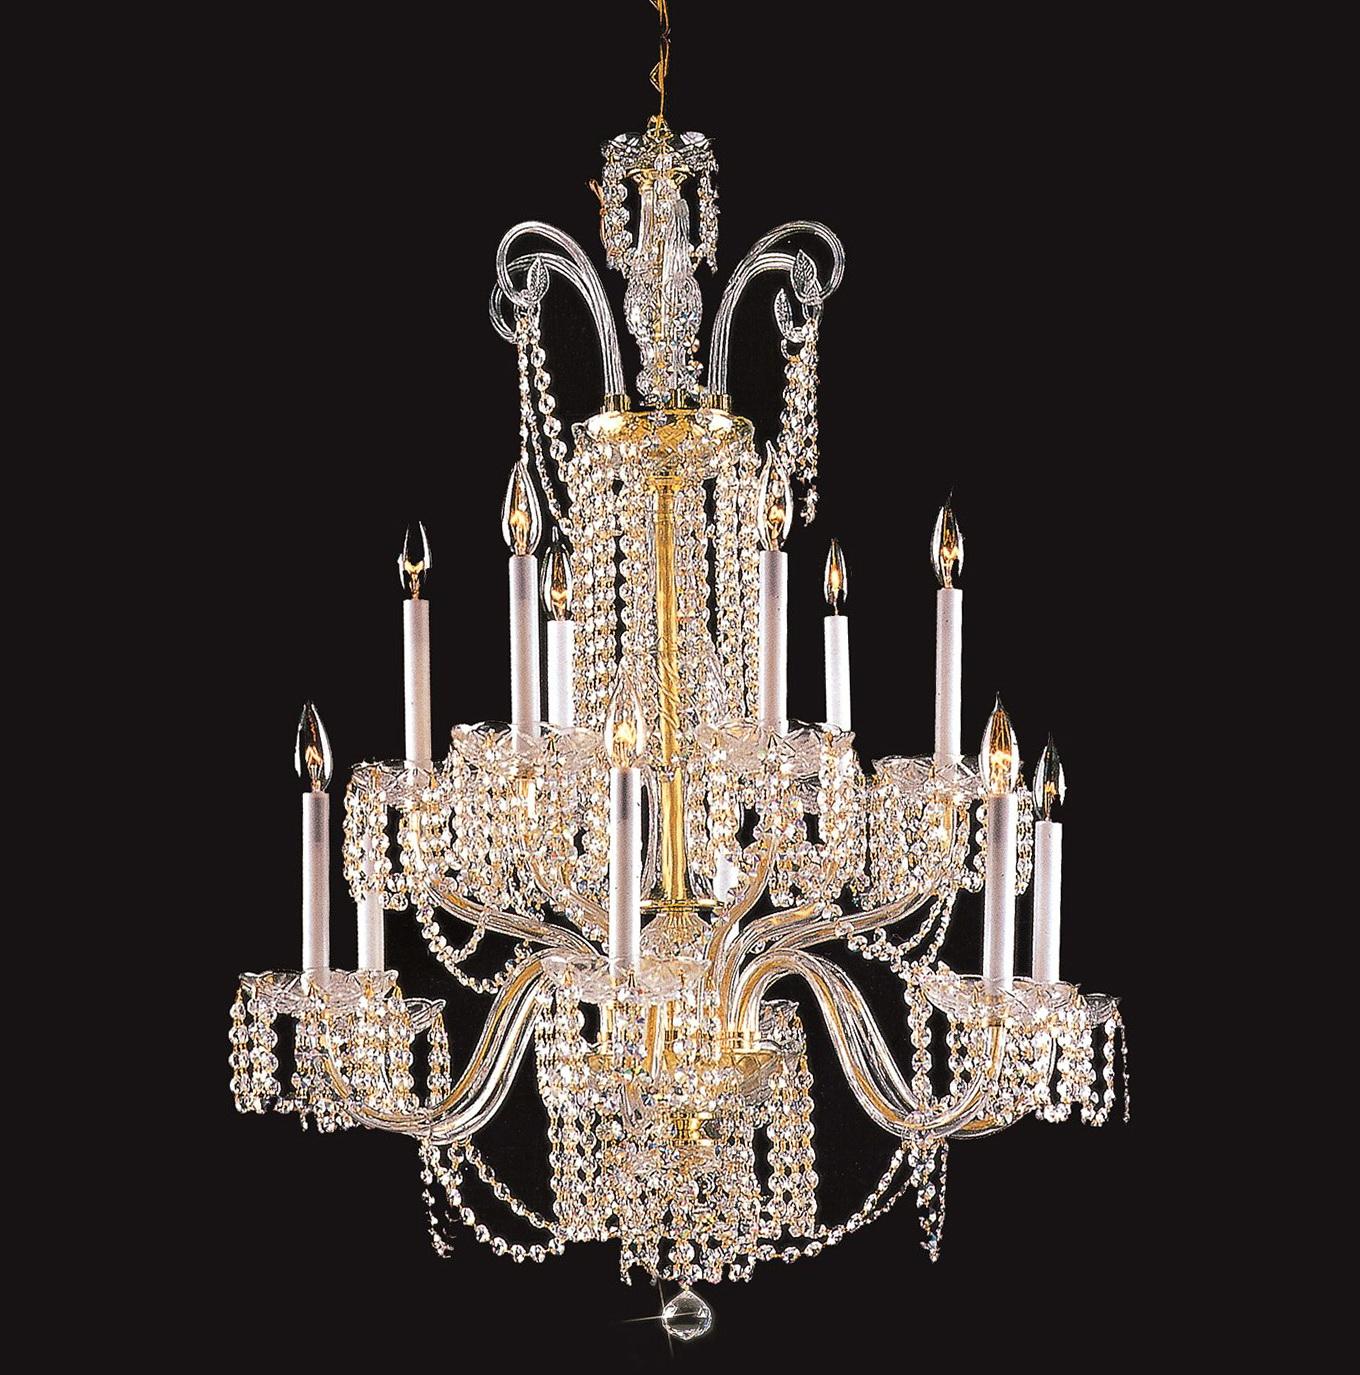 12 Light Crystal Chandelier